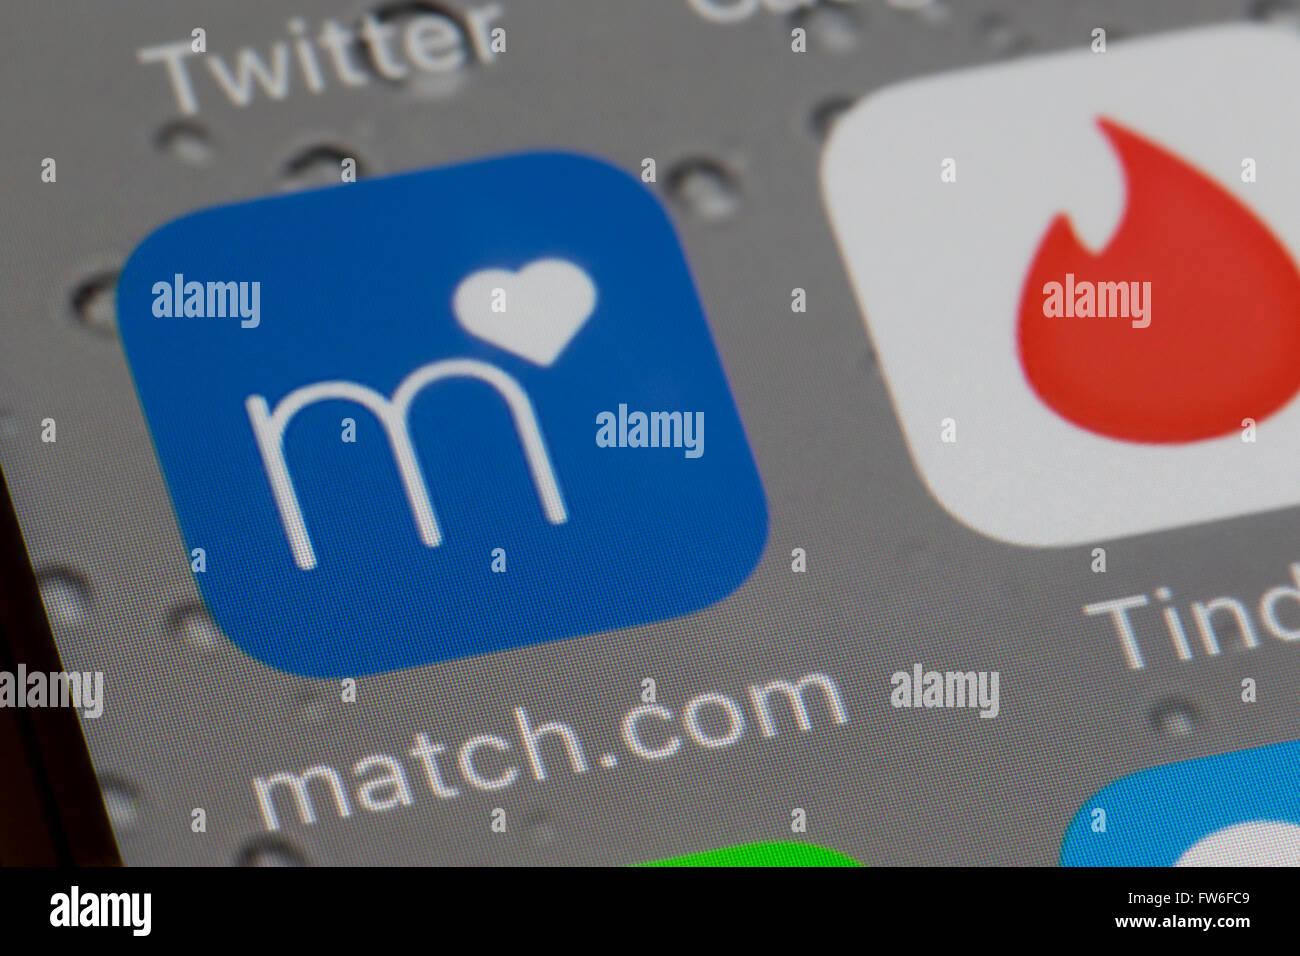 Dating App Stockfotos & Dating App Bilder - Alamy